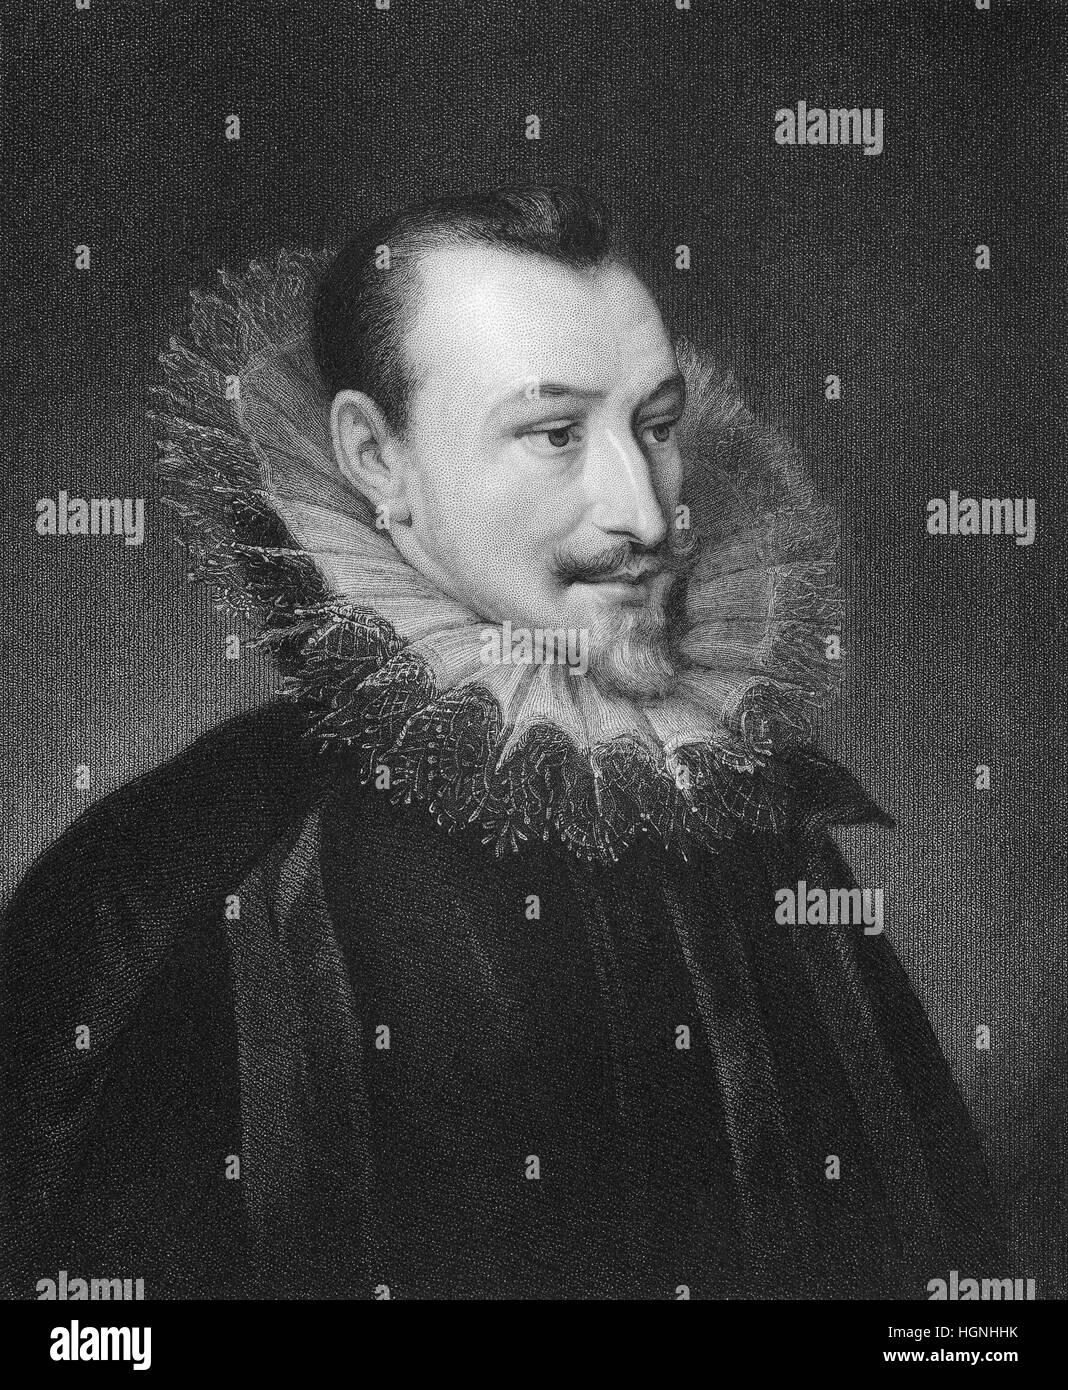 Edmund Spenser, ca. 1552 - 1599, an English poet - Stock Image